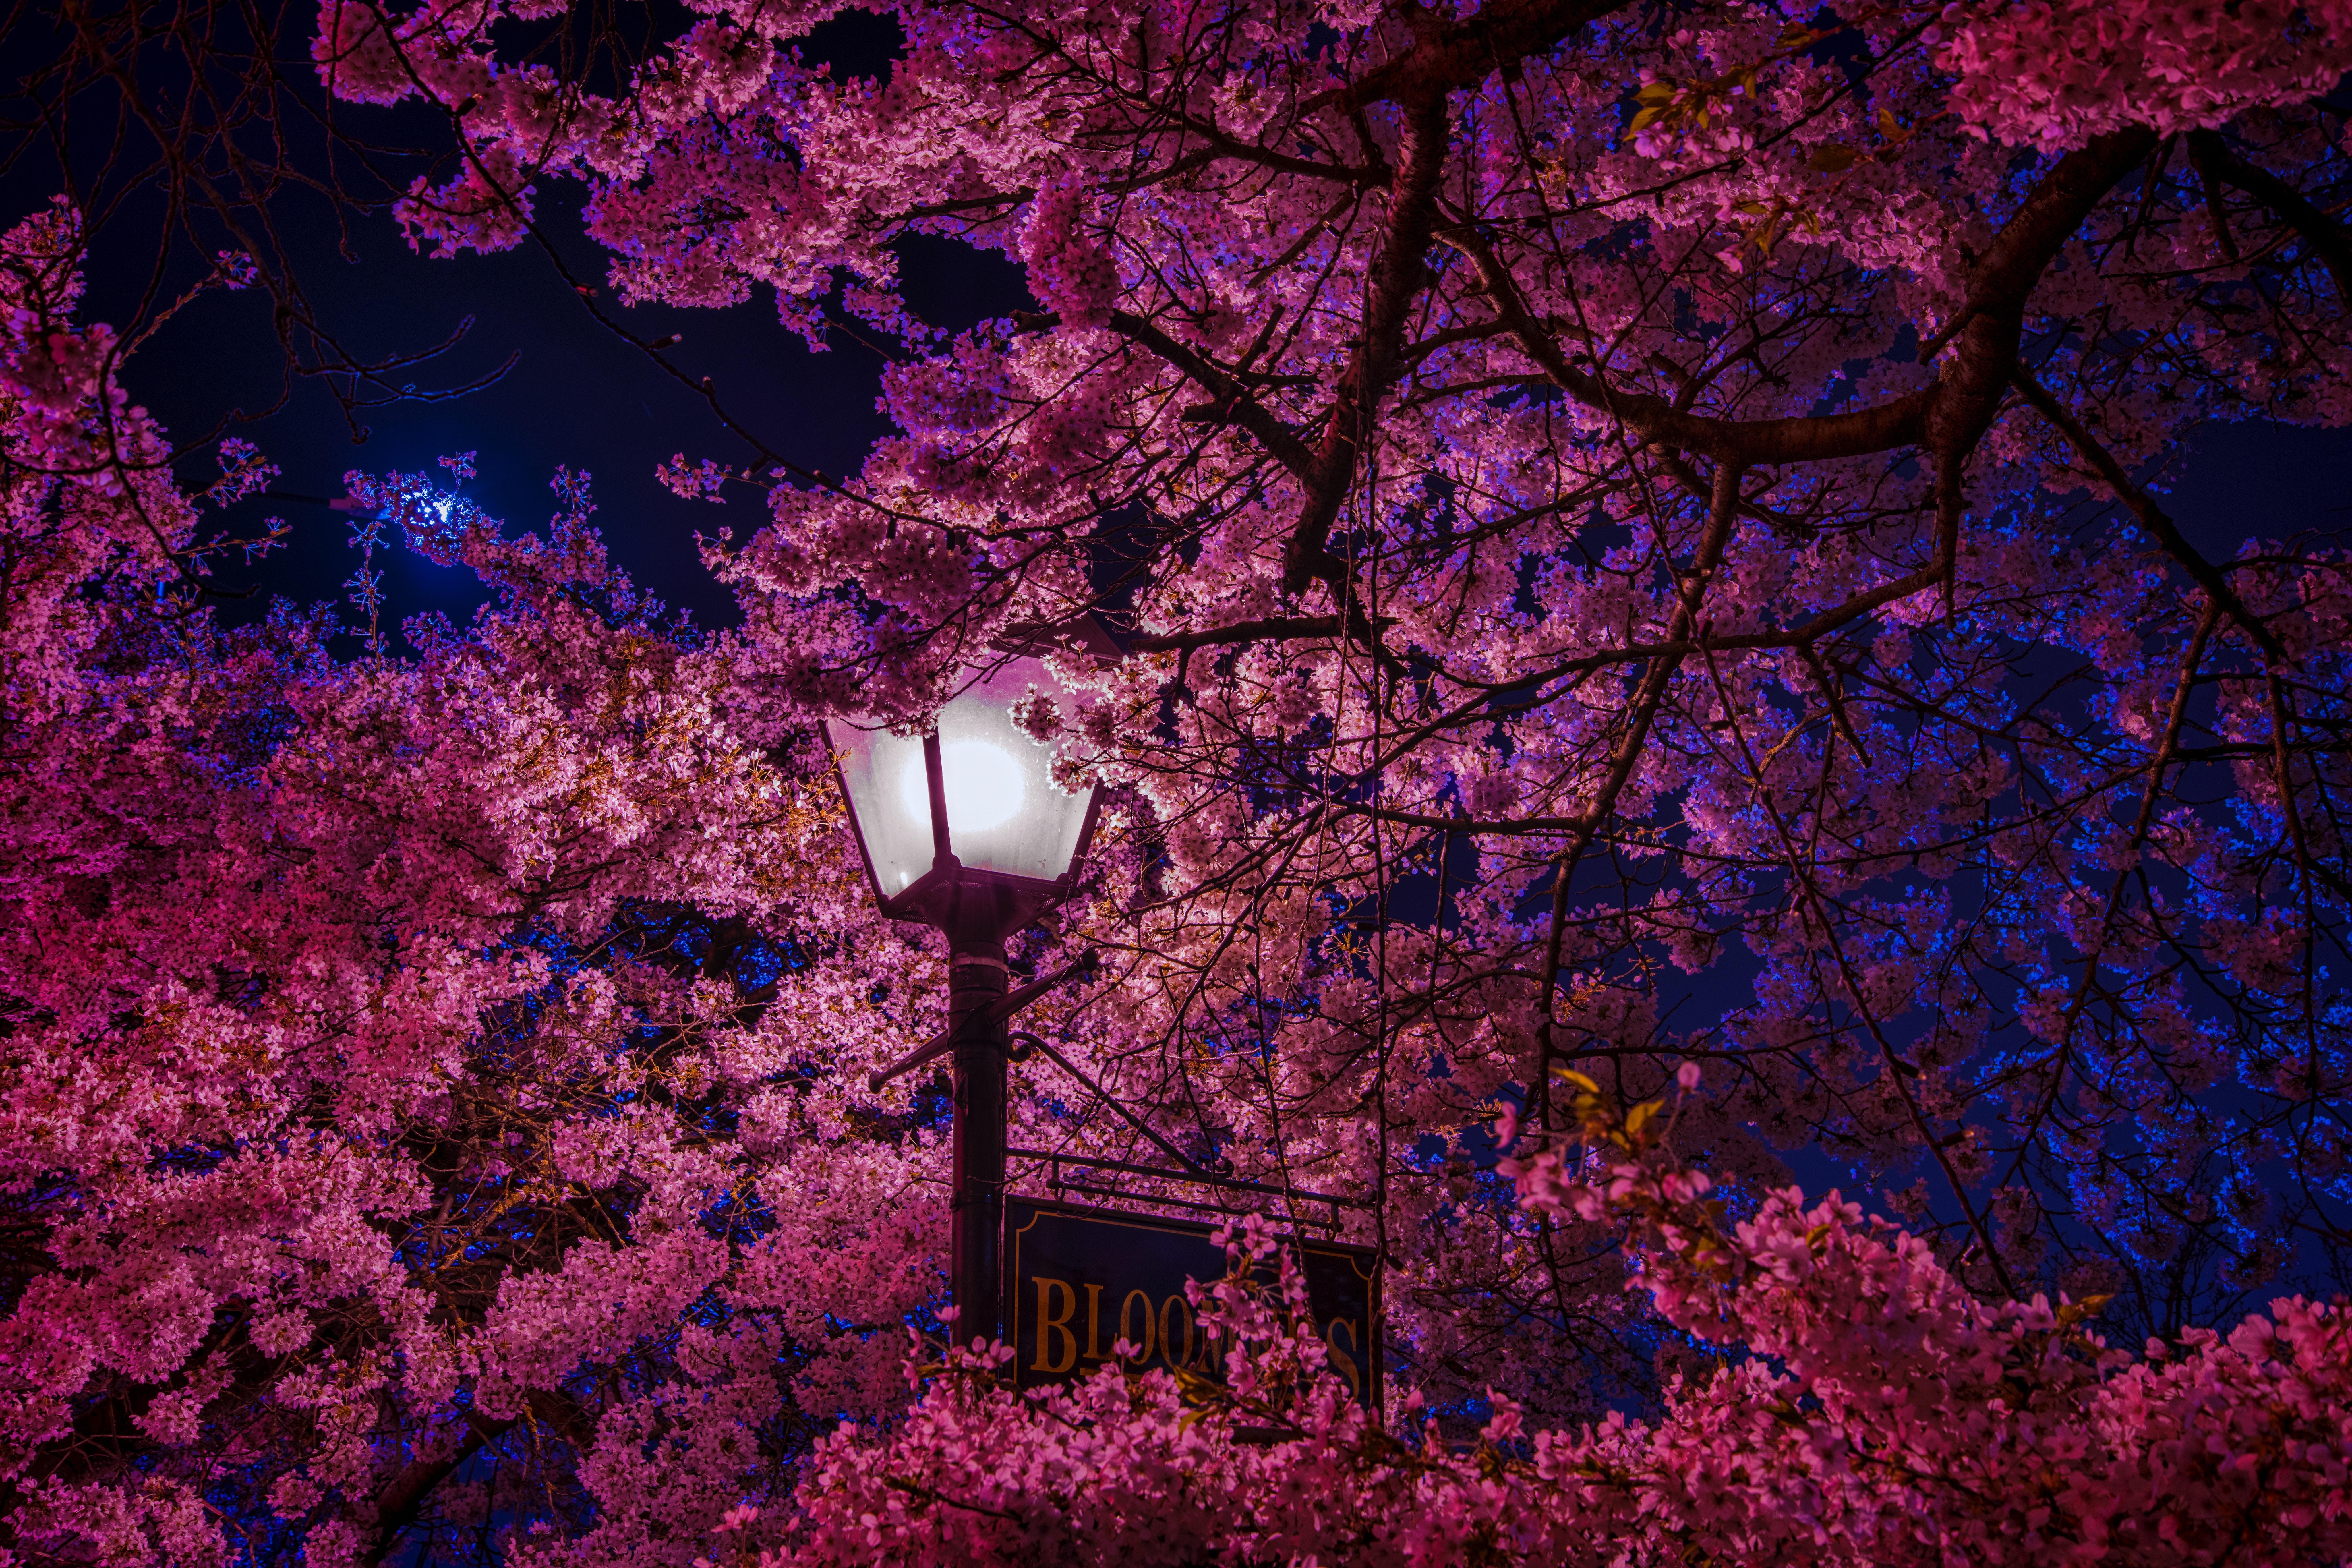 139037 Screensavers and Wallpapers Sakura for phone. Download Night, Sakura, Miscellanea, Miscellaneous, Lamp, Lantern, Spring, Blooms pictures for free